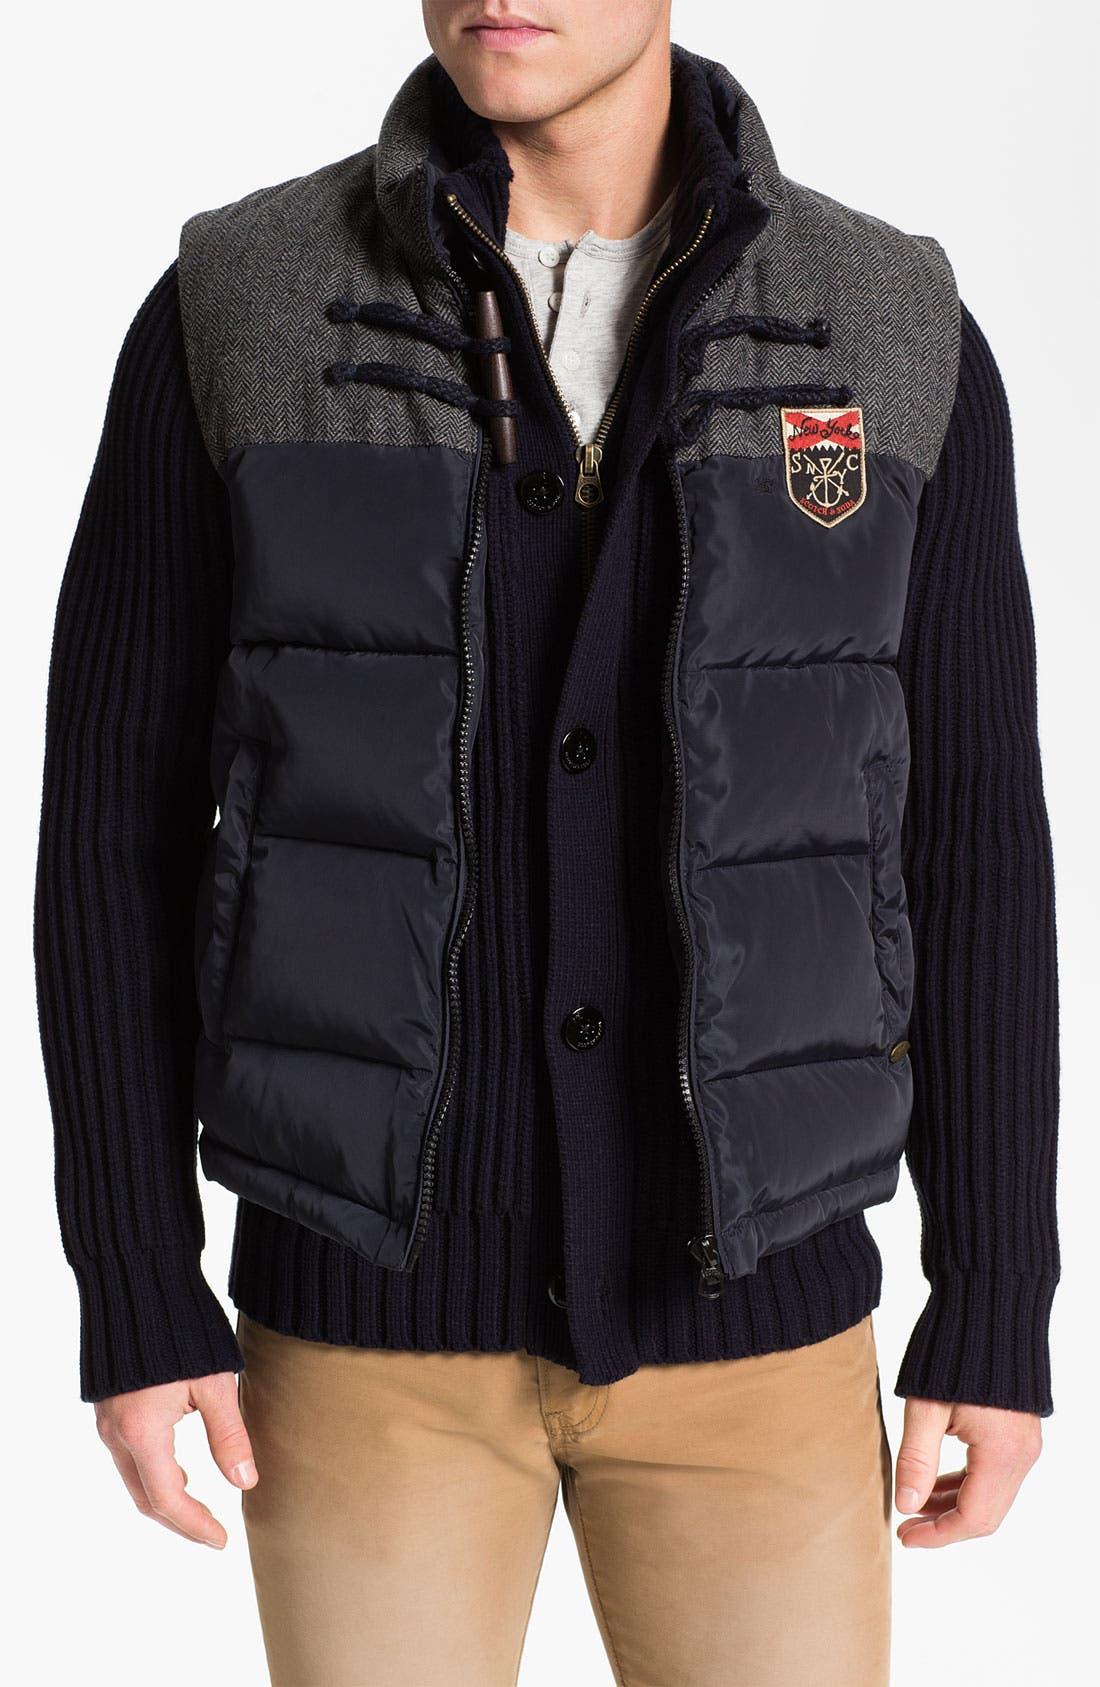 Alternate Image 1 Selected - Scotch & Soda Sweater & Vest Combo